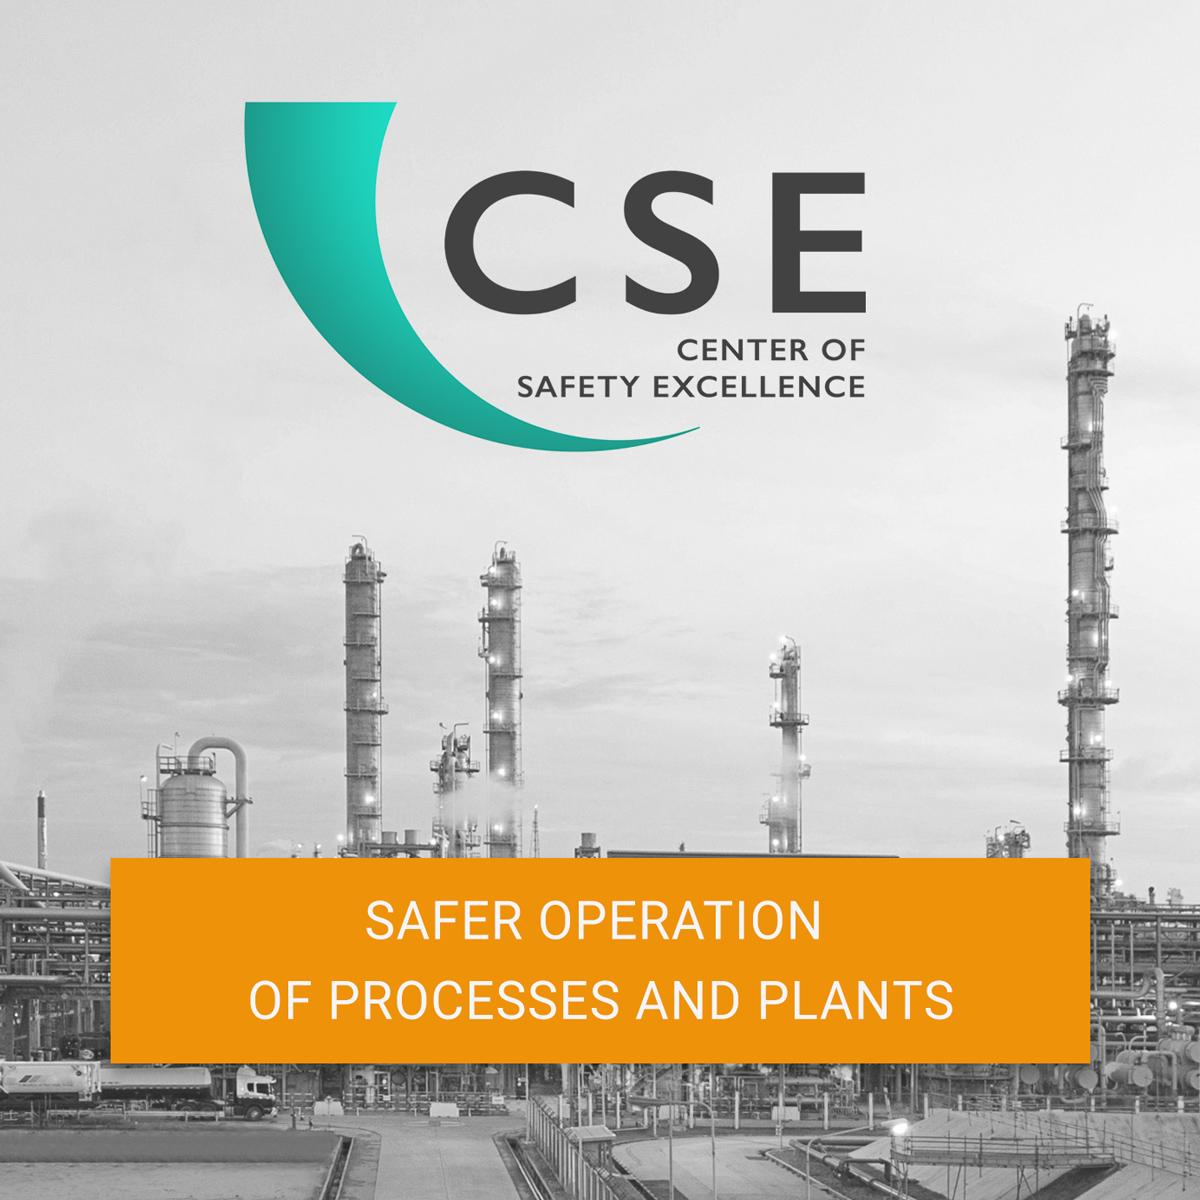 CSE-Engineering – The company